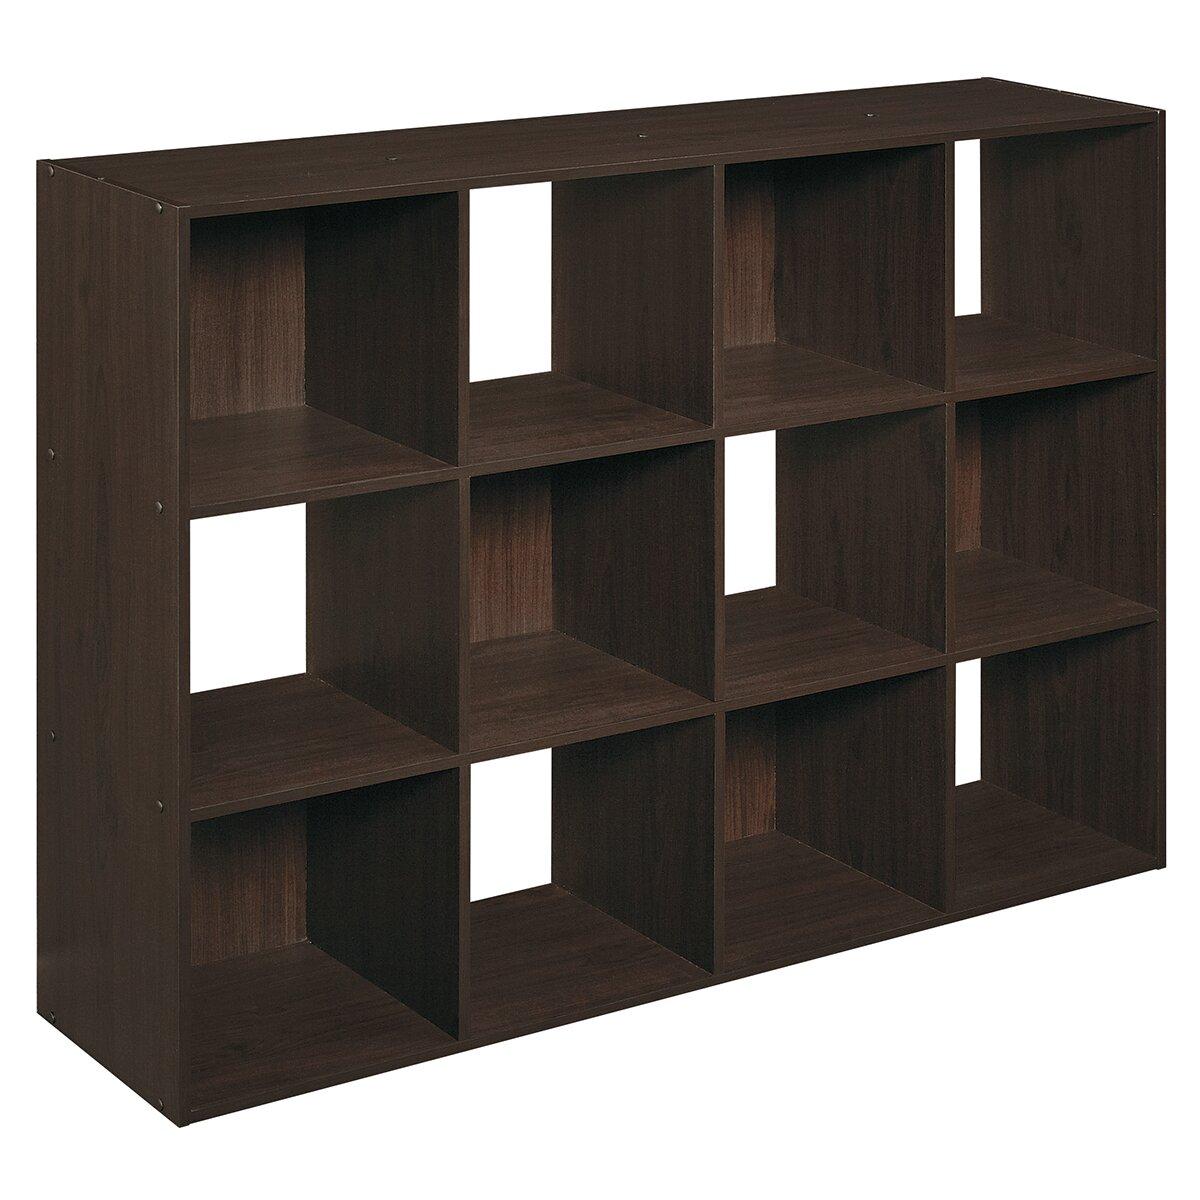 "Do It Yourself Home Design: ClosetMaid Cubeicals 35"" Cube Unit Bookcase & Reviews"